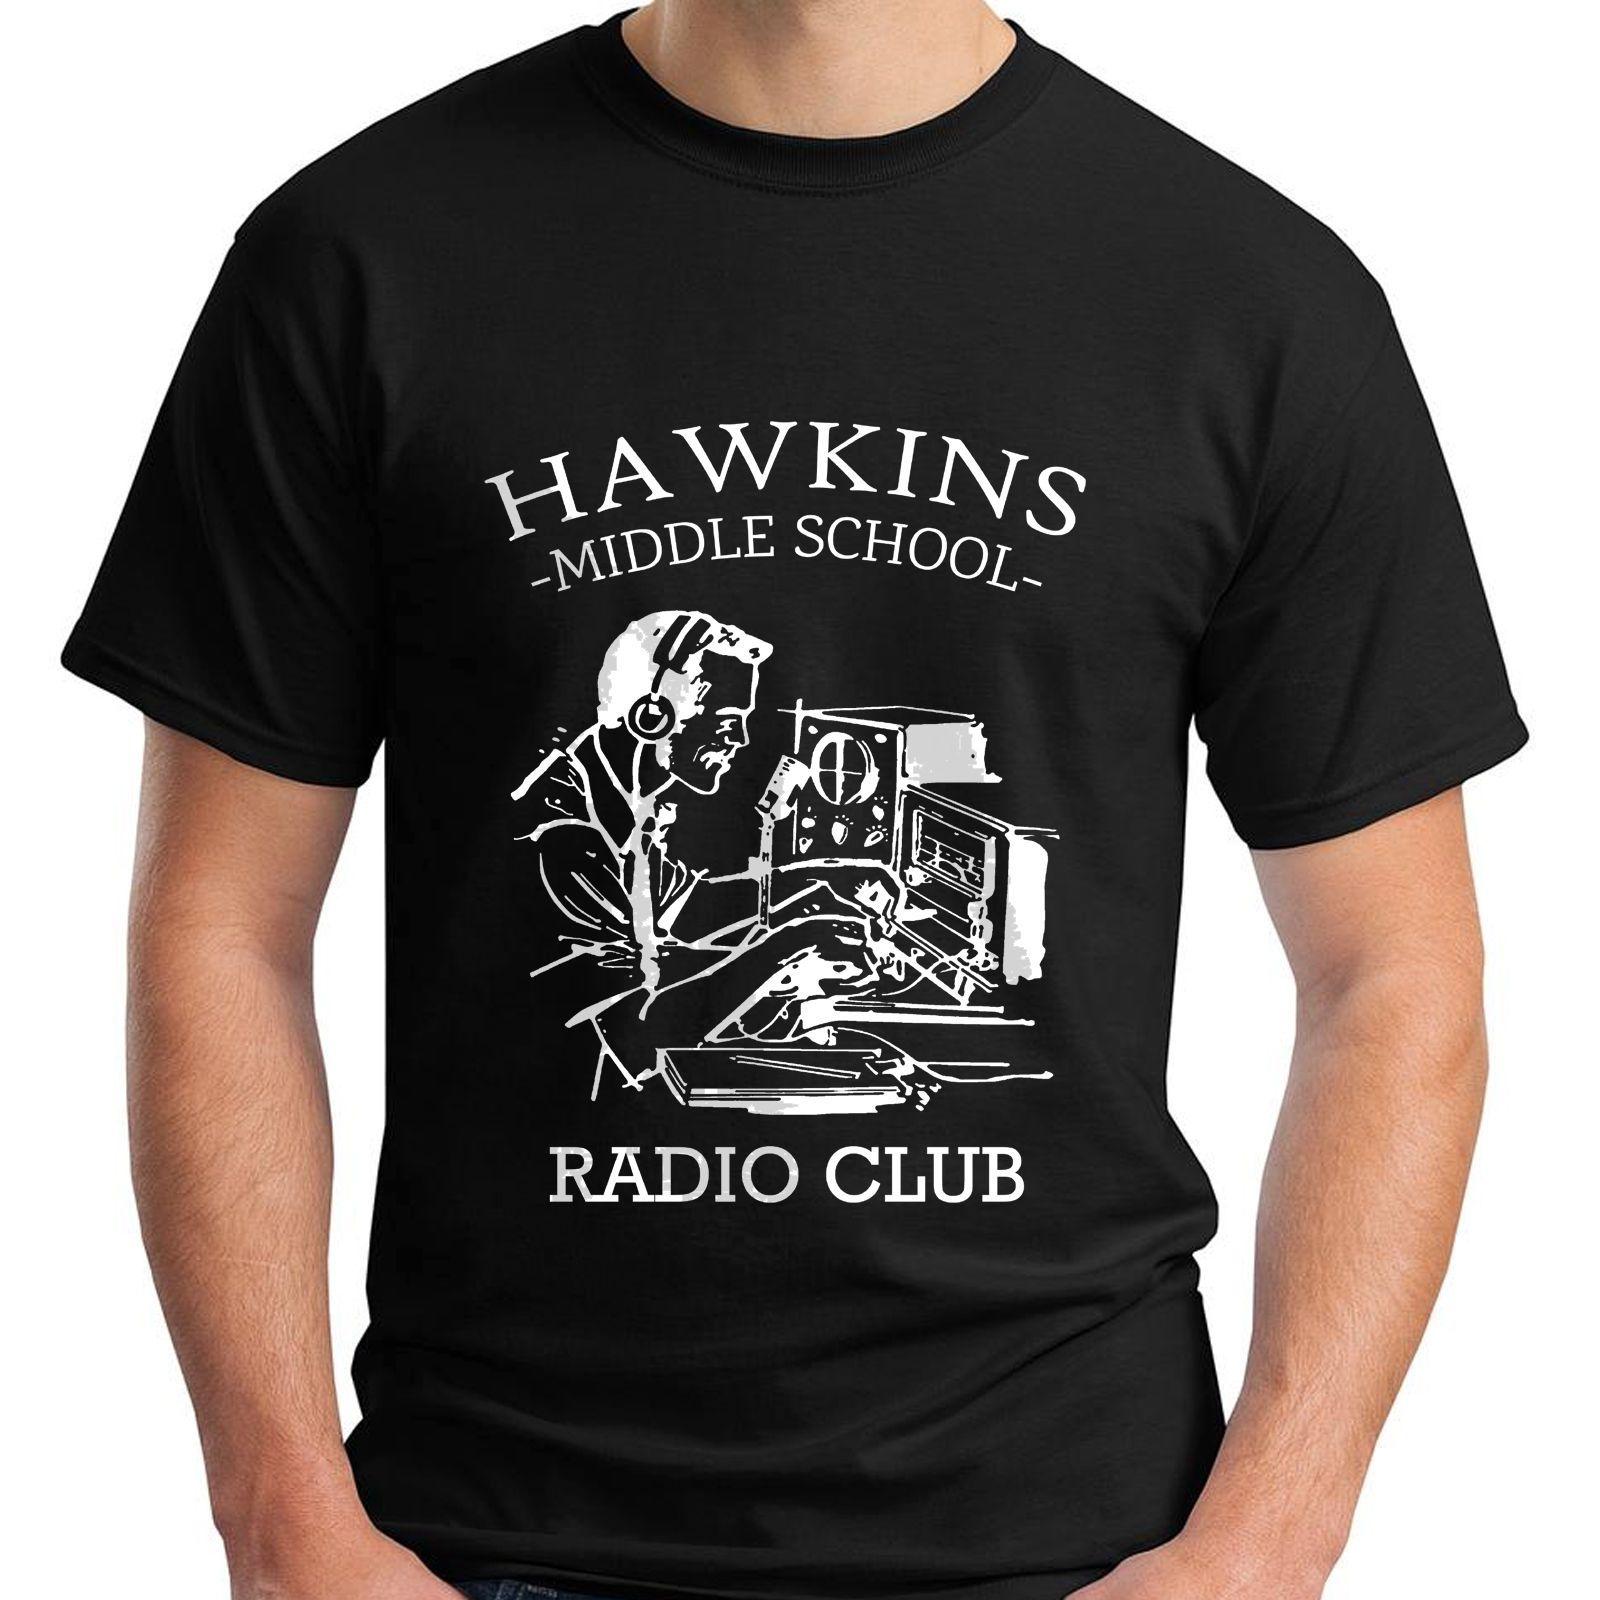 Großhandel Hawkins Middle School Radio Av Club Fremden Dinge